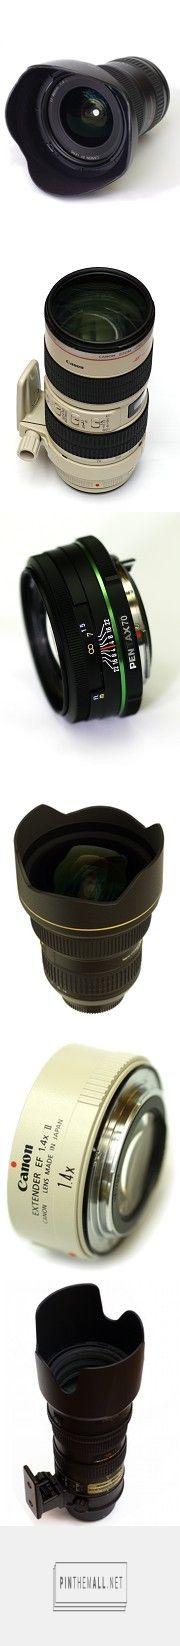 Objectif Photo Matriel Meilleur Photographie Nikon Sony